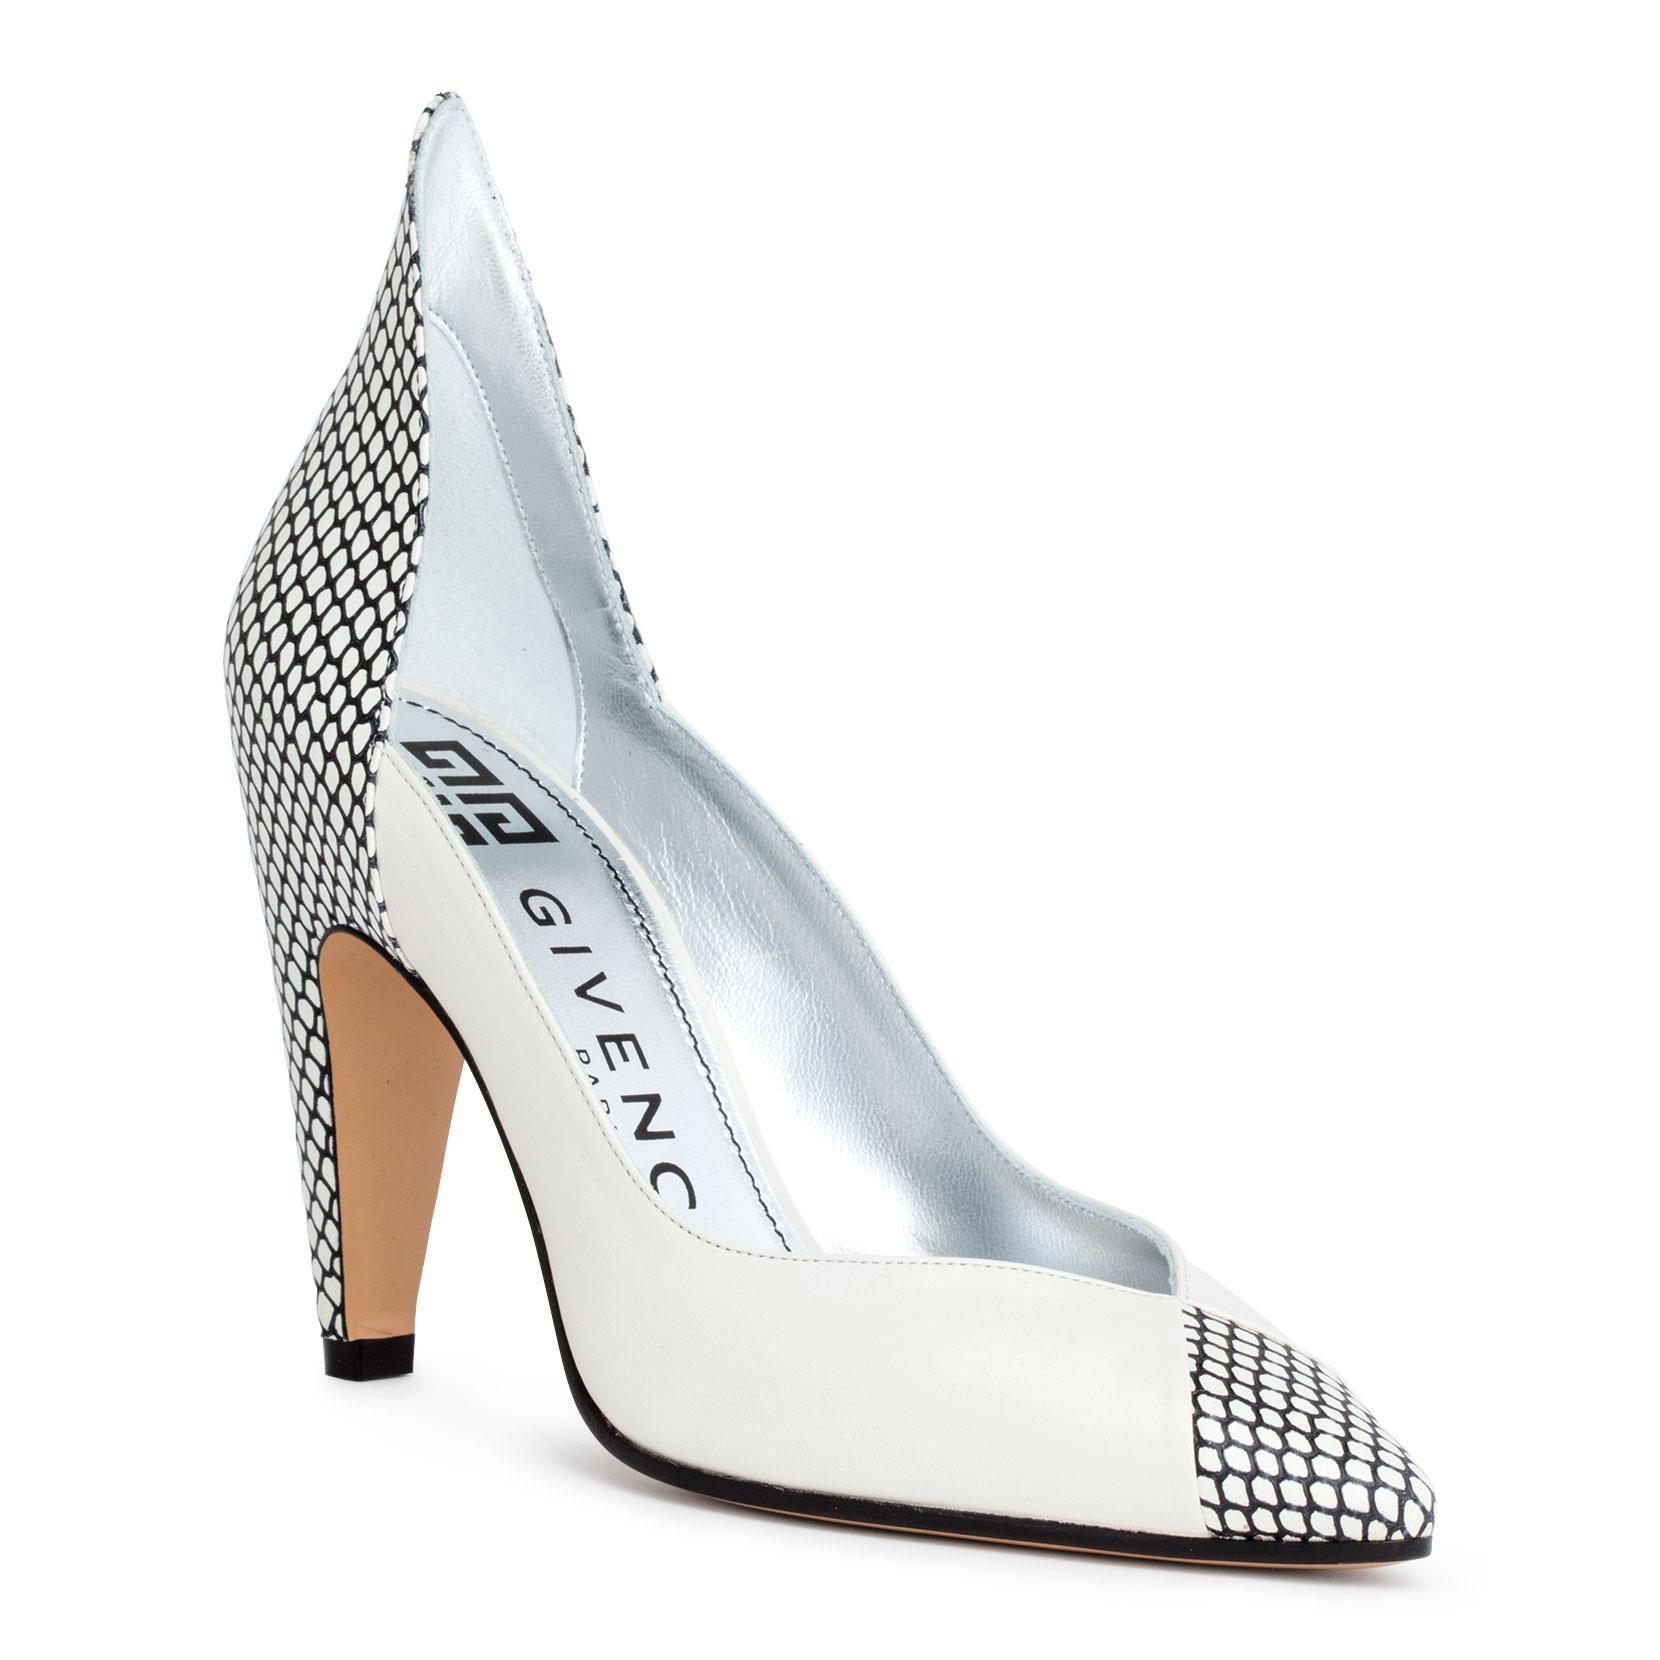 White 95 leather pumps Givenchy tTZTJ2D6OS